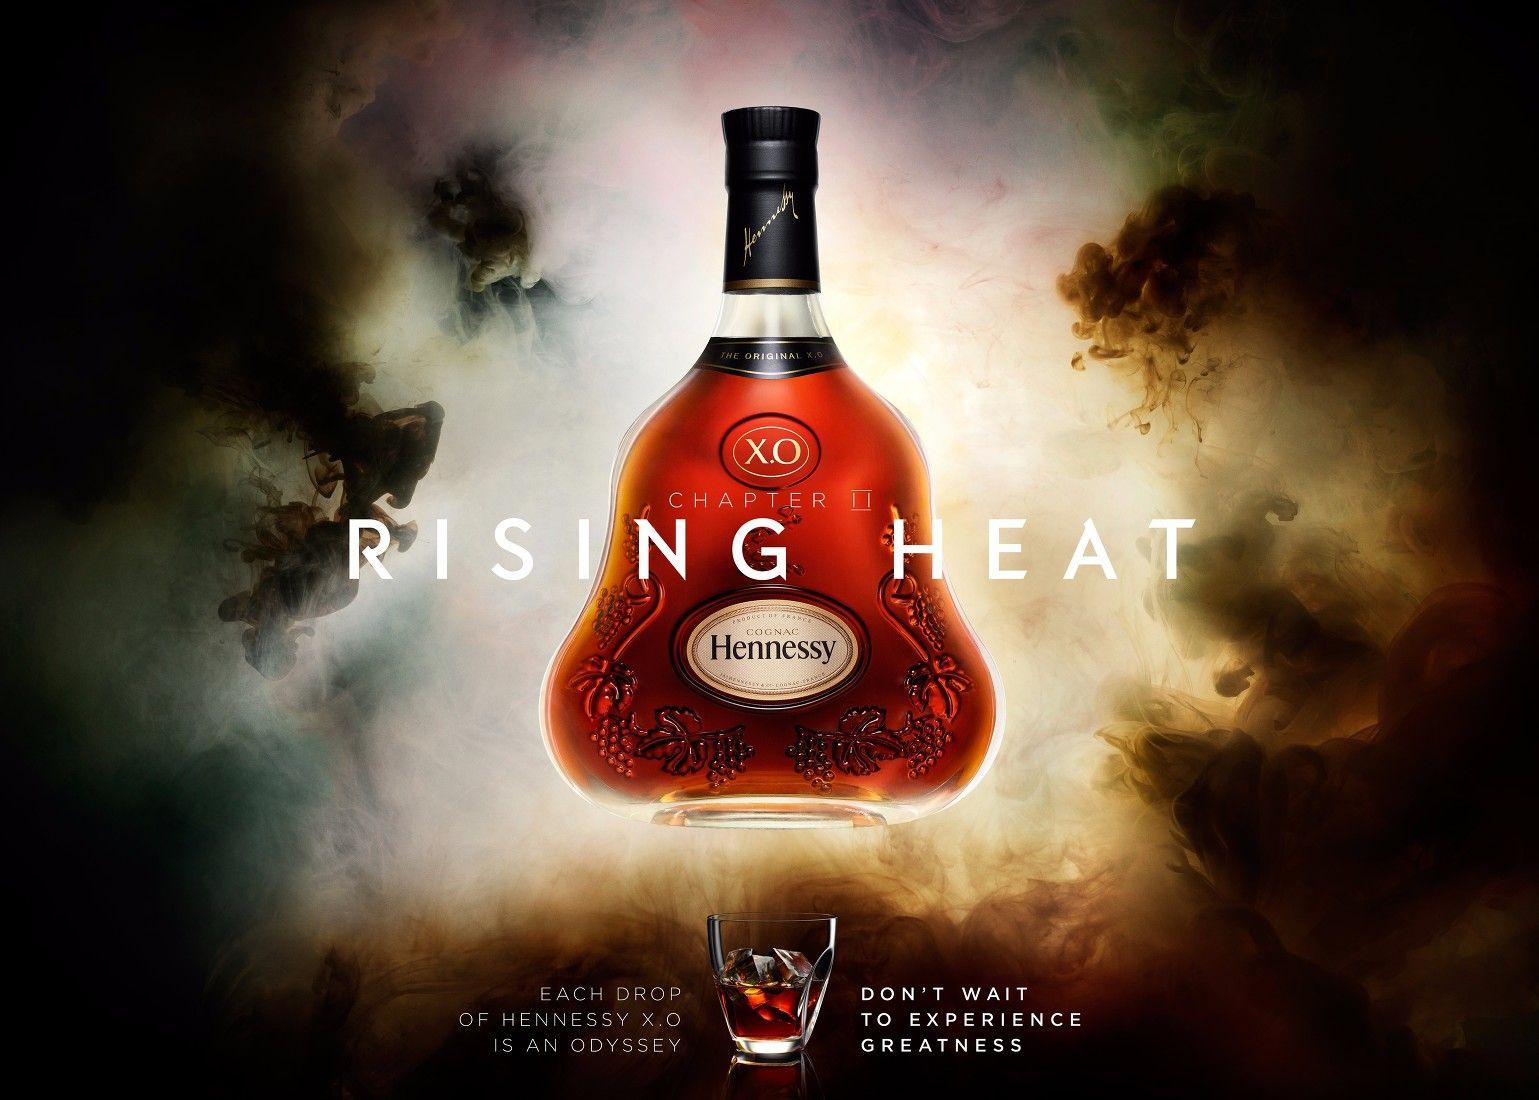 Dan Tobin Smith Hennessy Xo Hennessy Wine And Spirits Wine Design